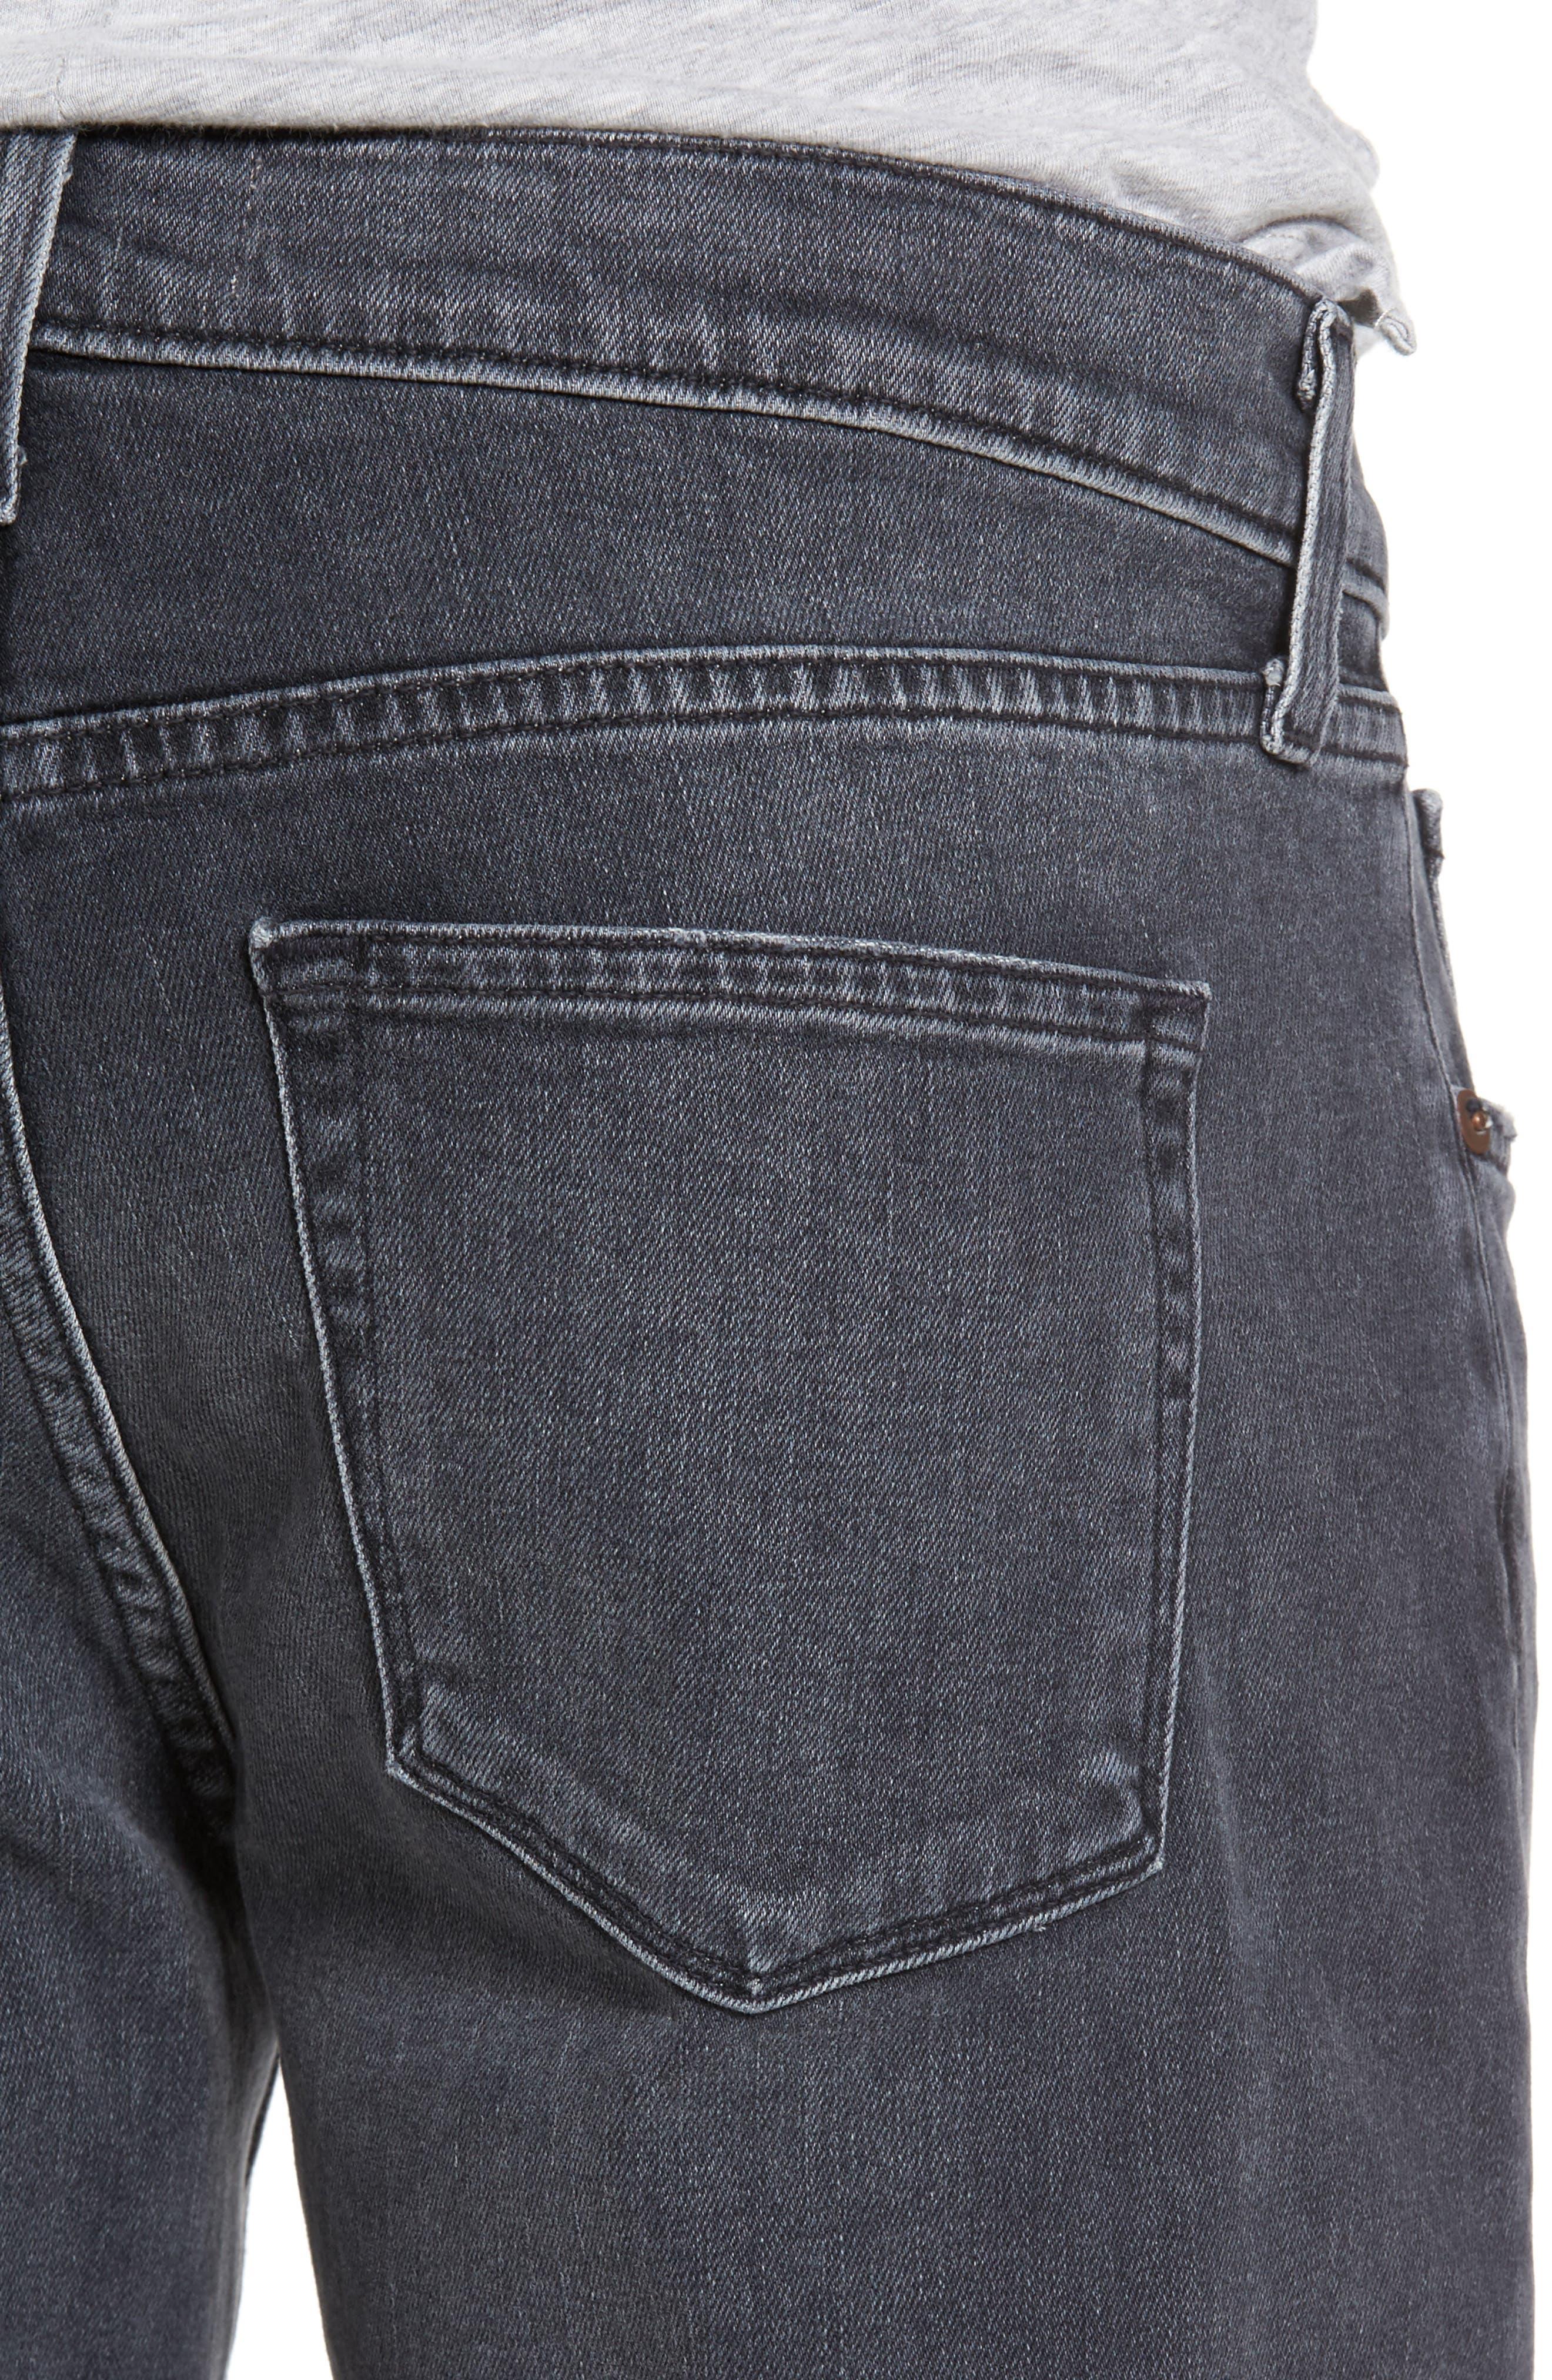 Alternate Image 4  - J Brand Tyler Slim Jeans (Sagitarii)